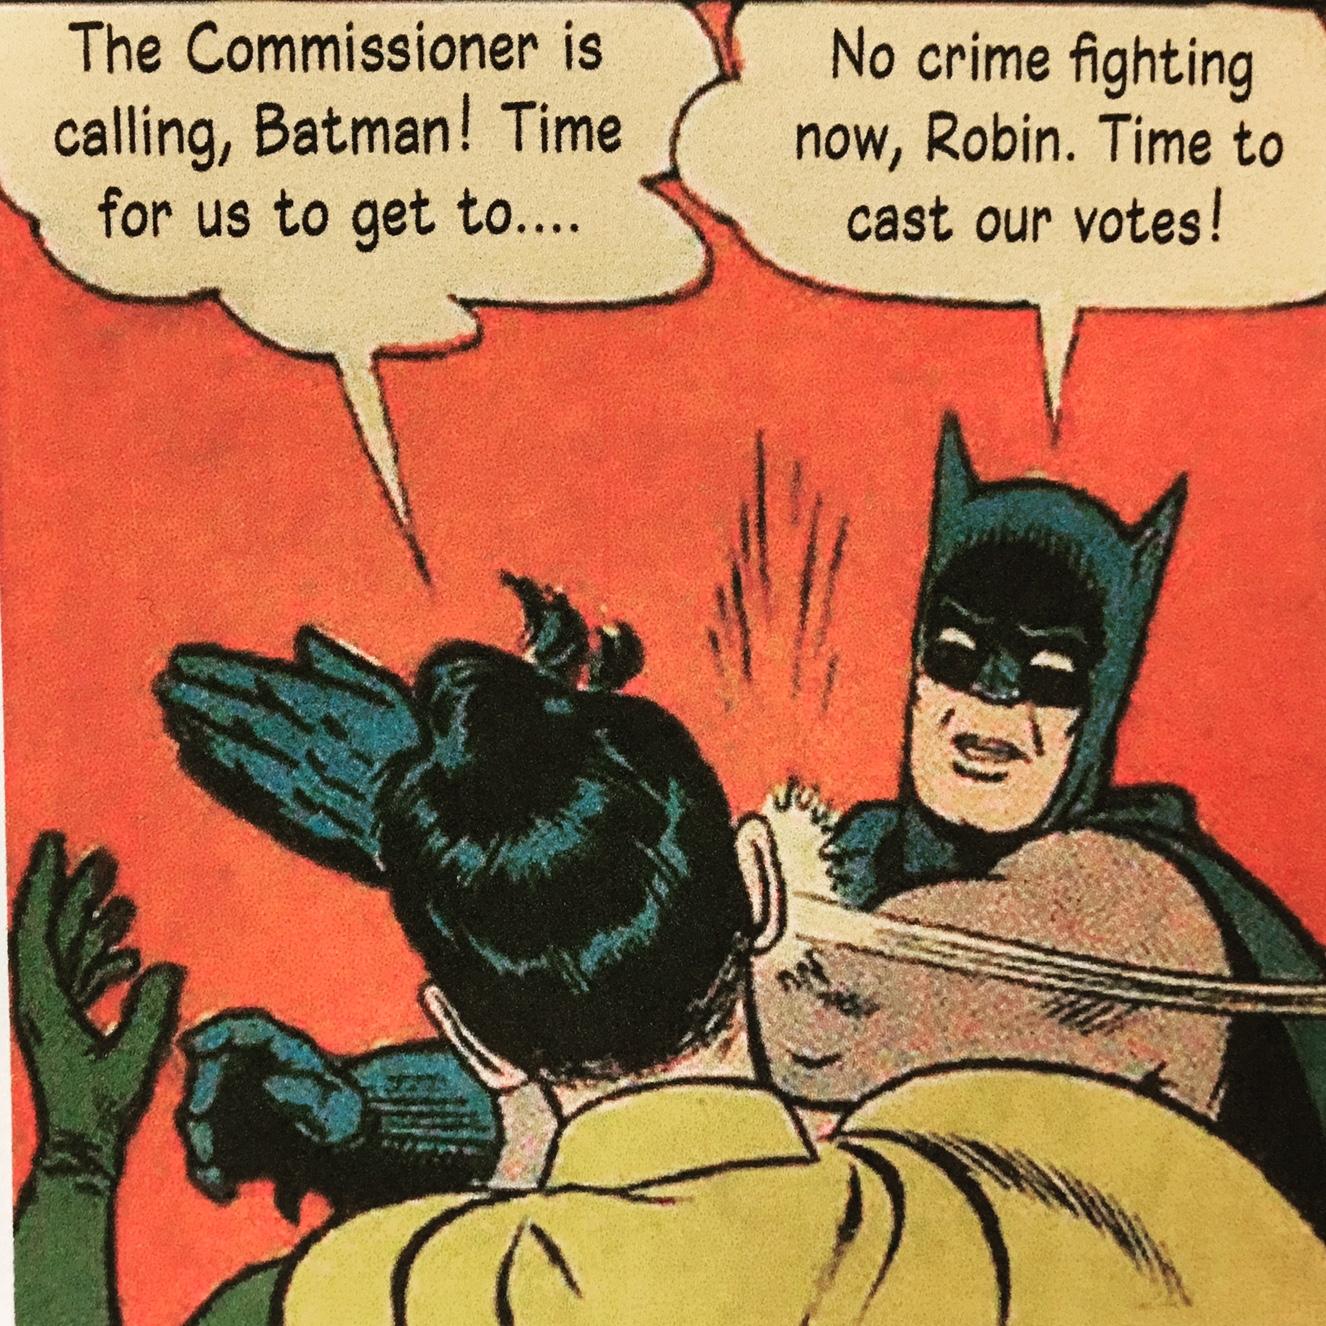 Even Batman is a Civic Superhero!